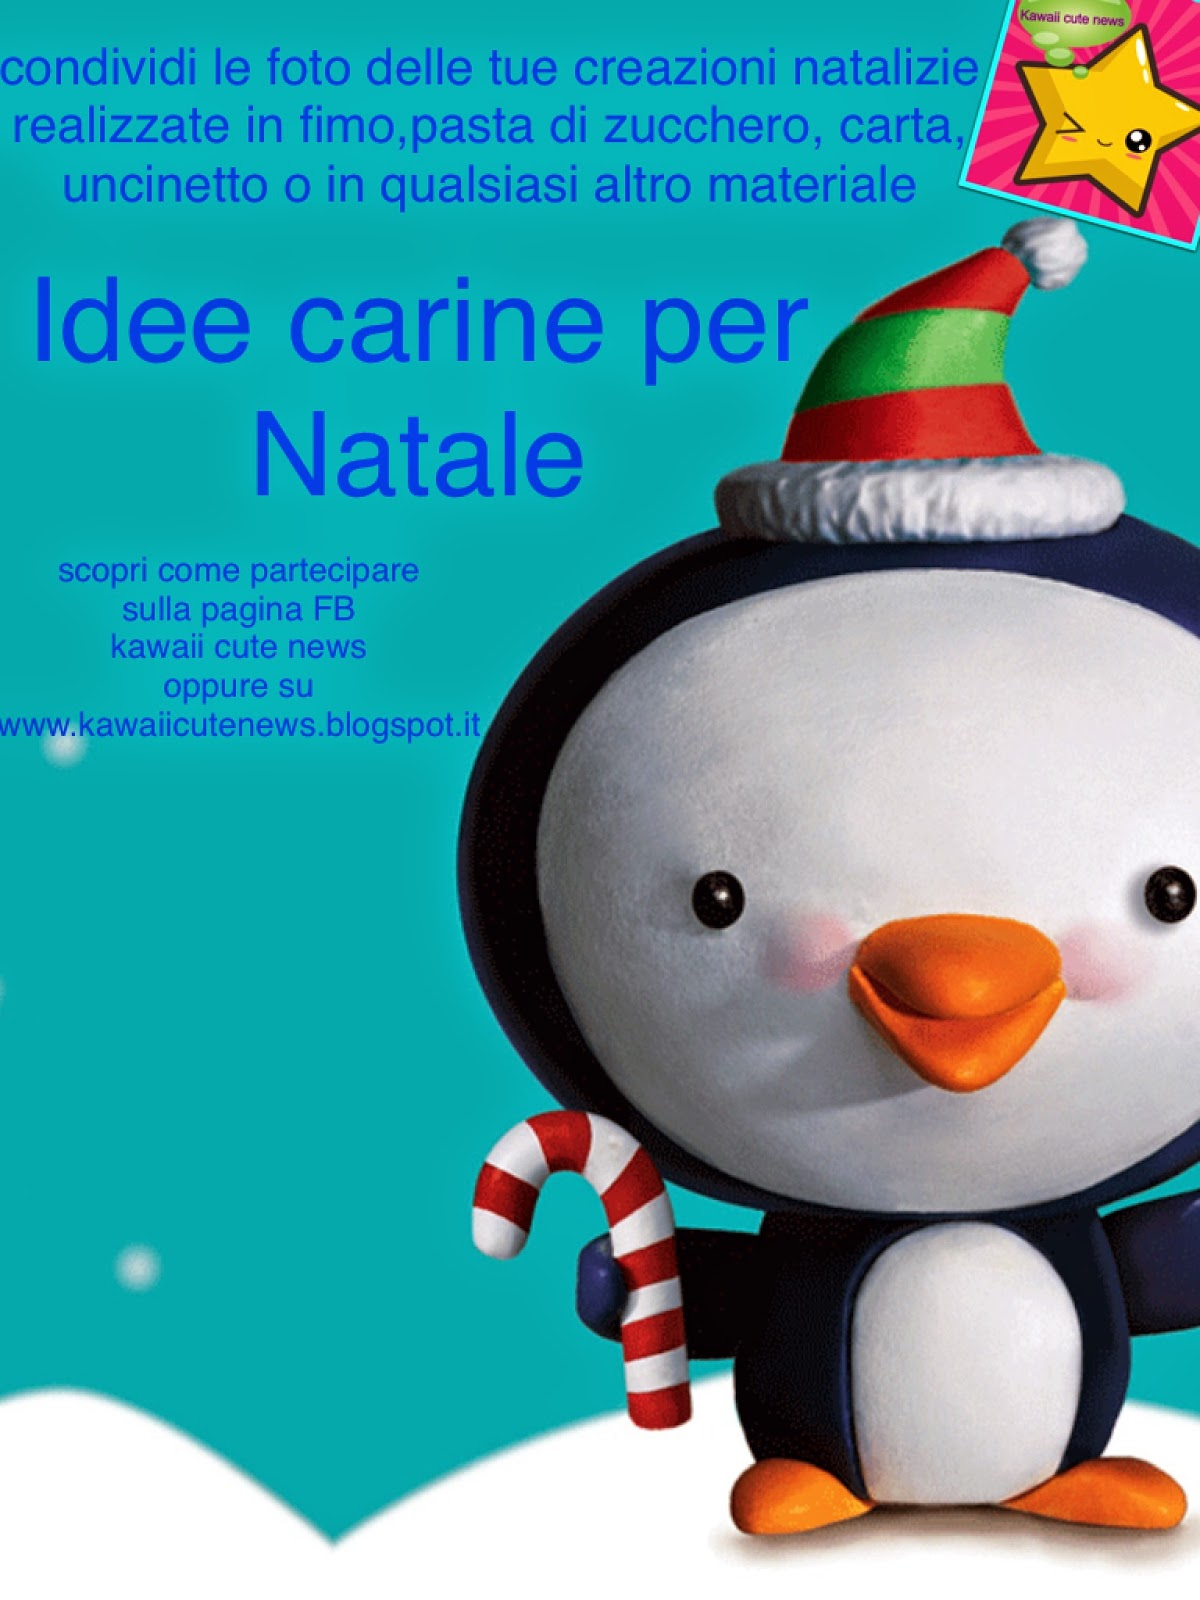 Immagini Natalizie Kawaii.Idee Carine Per Natale Kawaii Cute News